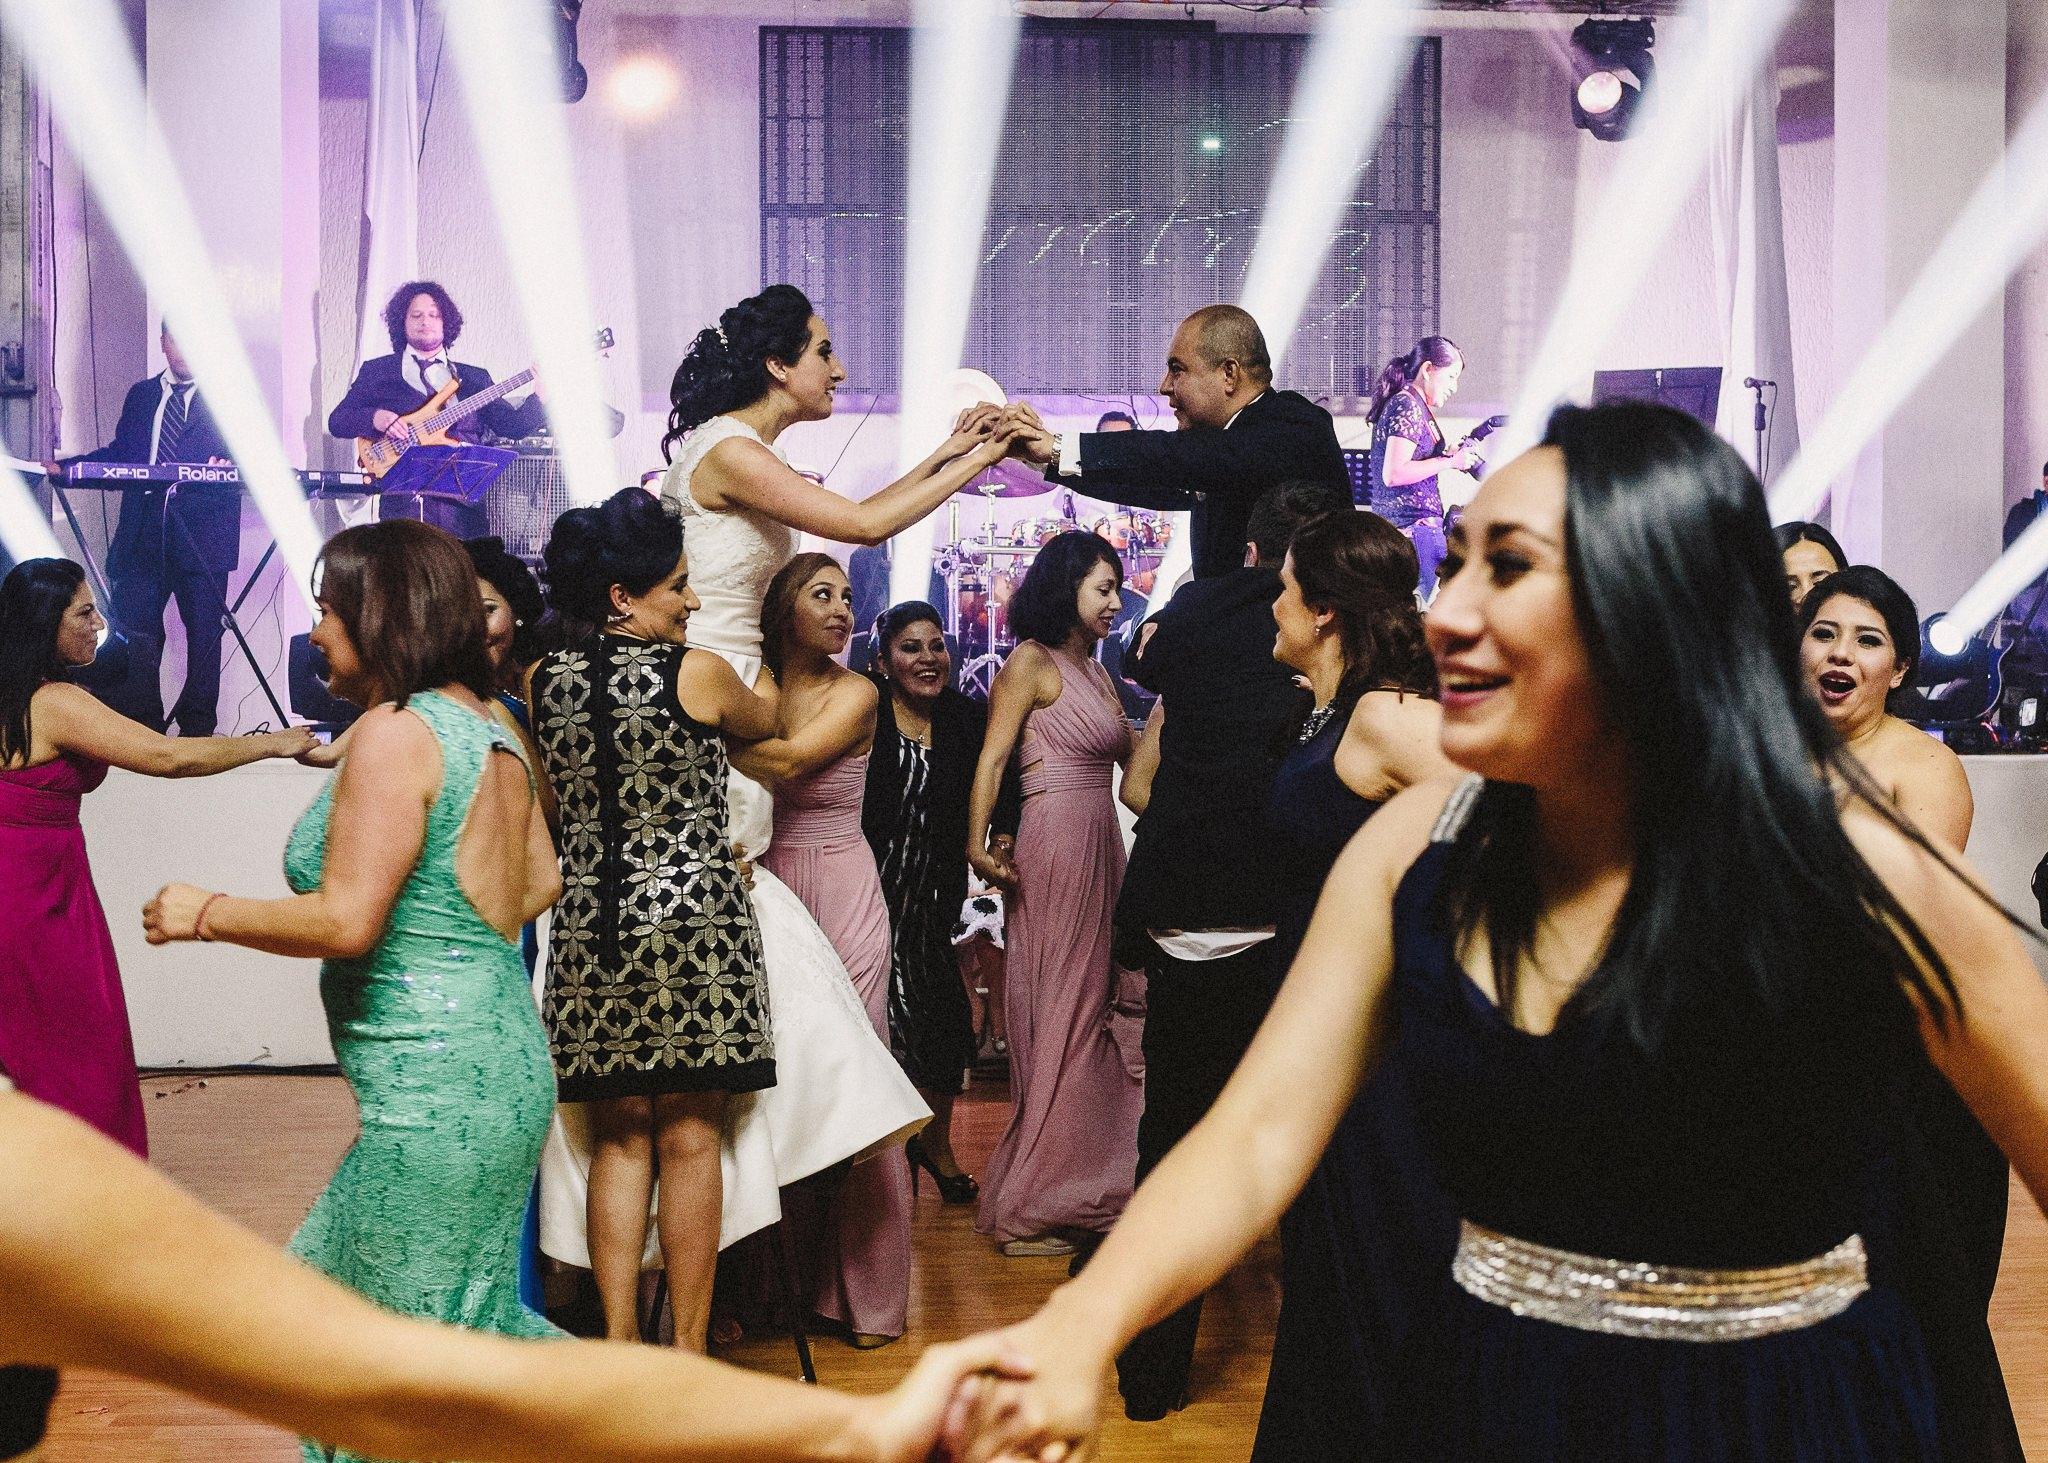 Wedding-Boda-Tulancingo-Hidalgo-Salon-Essenzia-Luis-Houdin-63-film